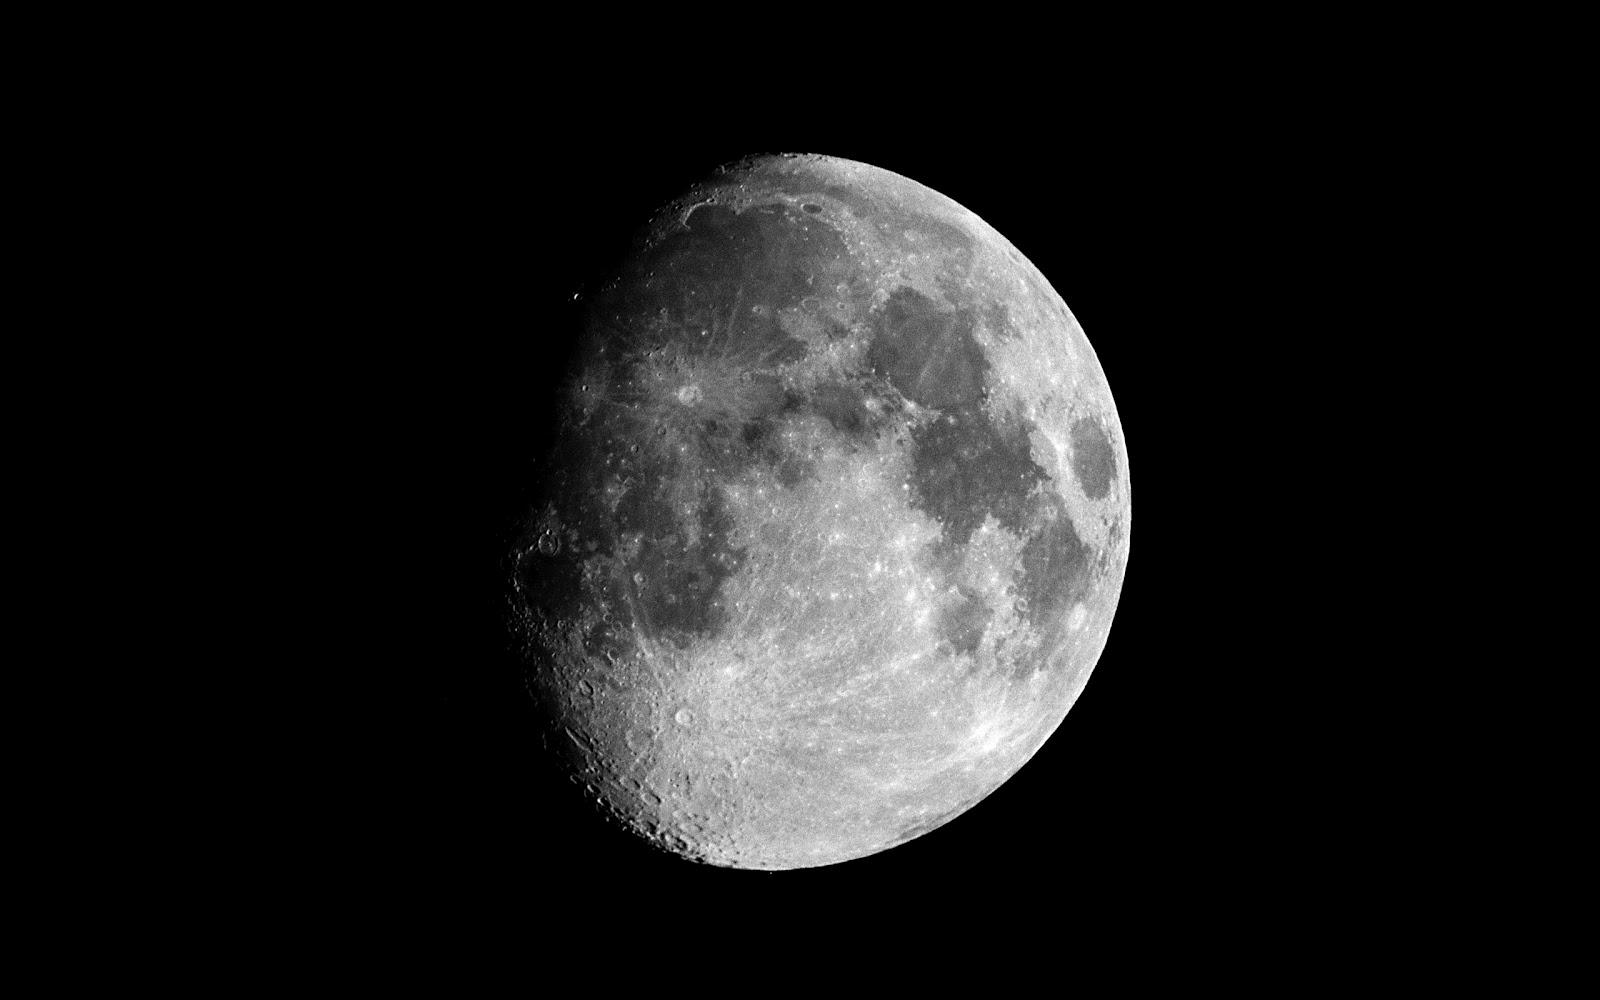 http://3.bp.blogspot.com/-AGJINvo4jVc/T6k5XNm7DSI/AAAAAAAADY0/NCTbUvfey58/s1600/Moon-HD-Wallpaper.jpg